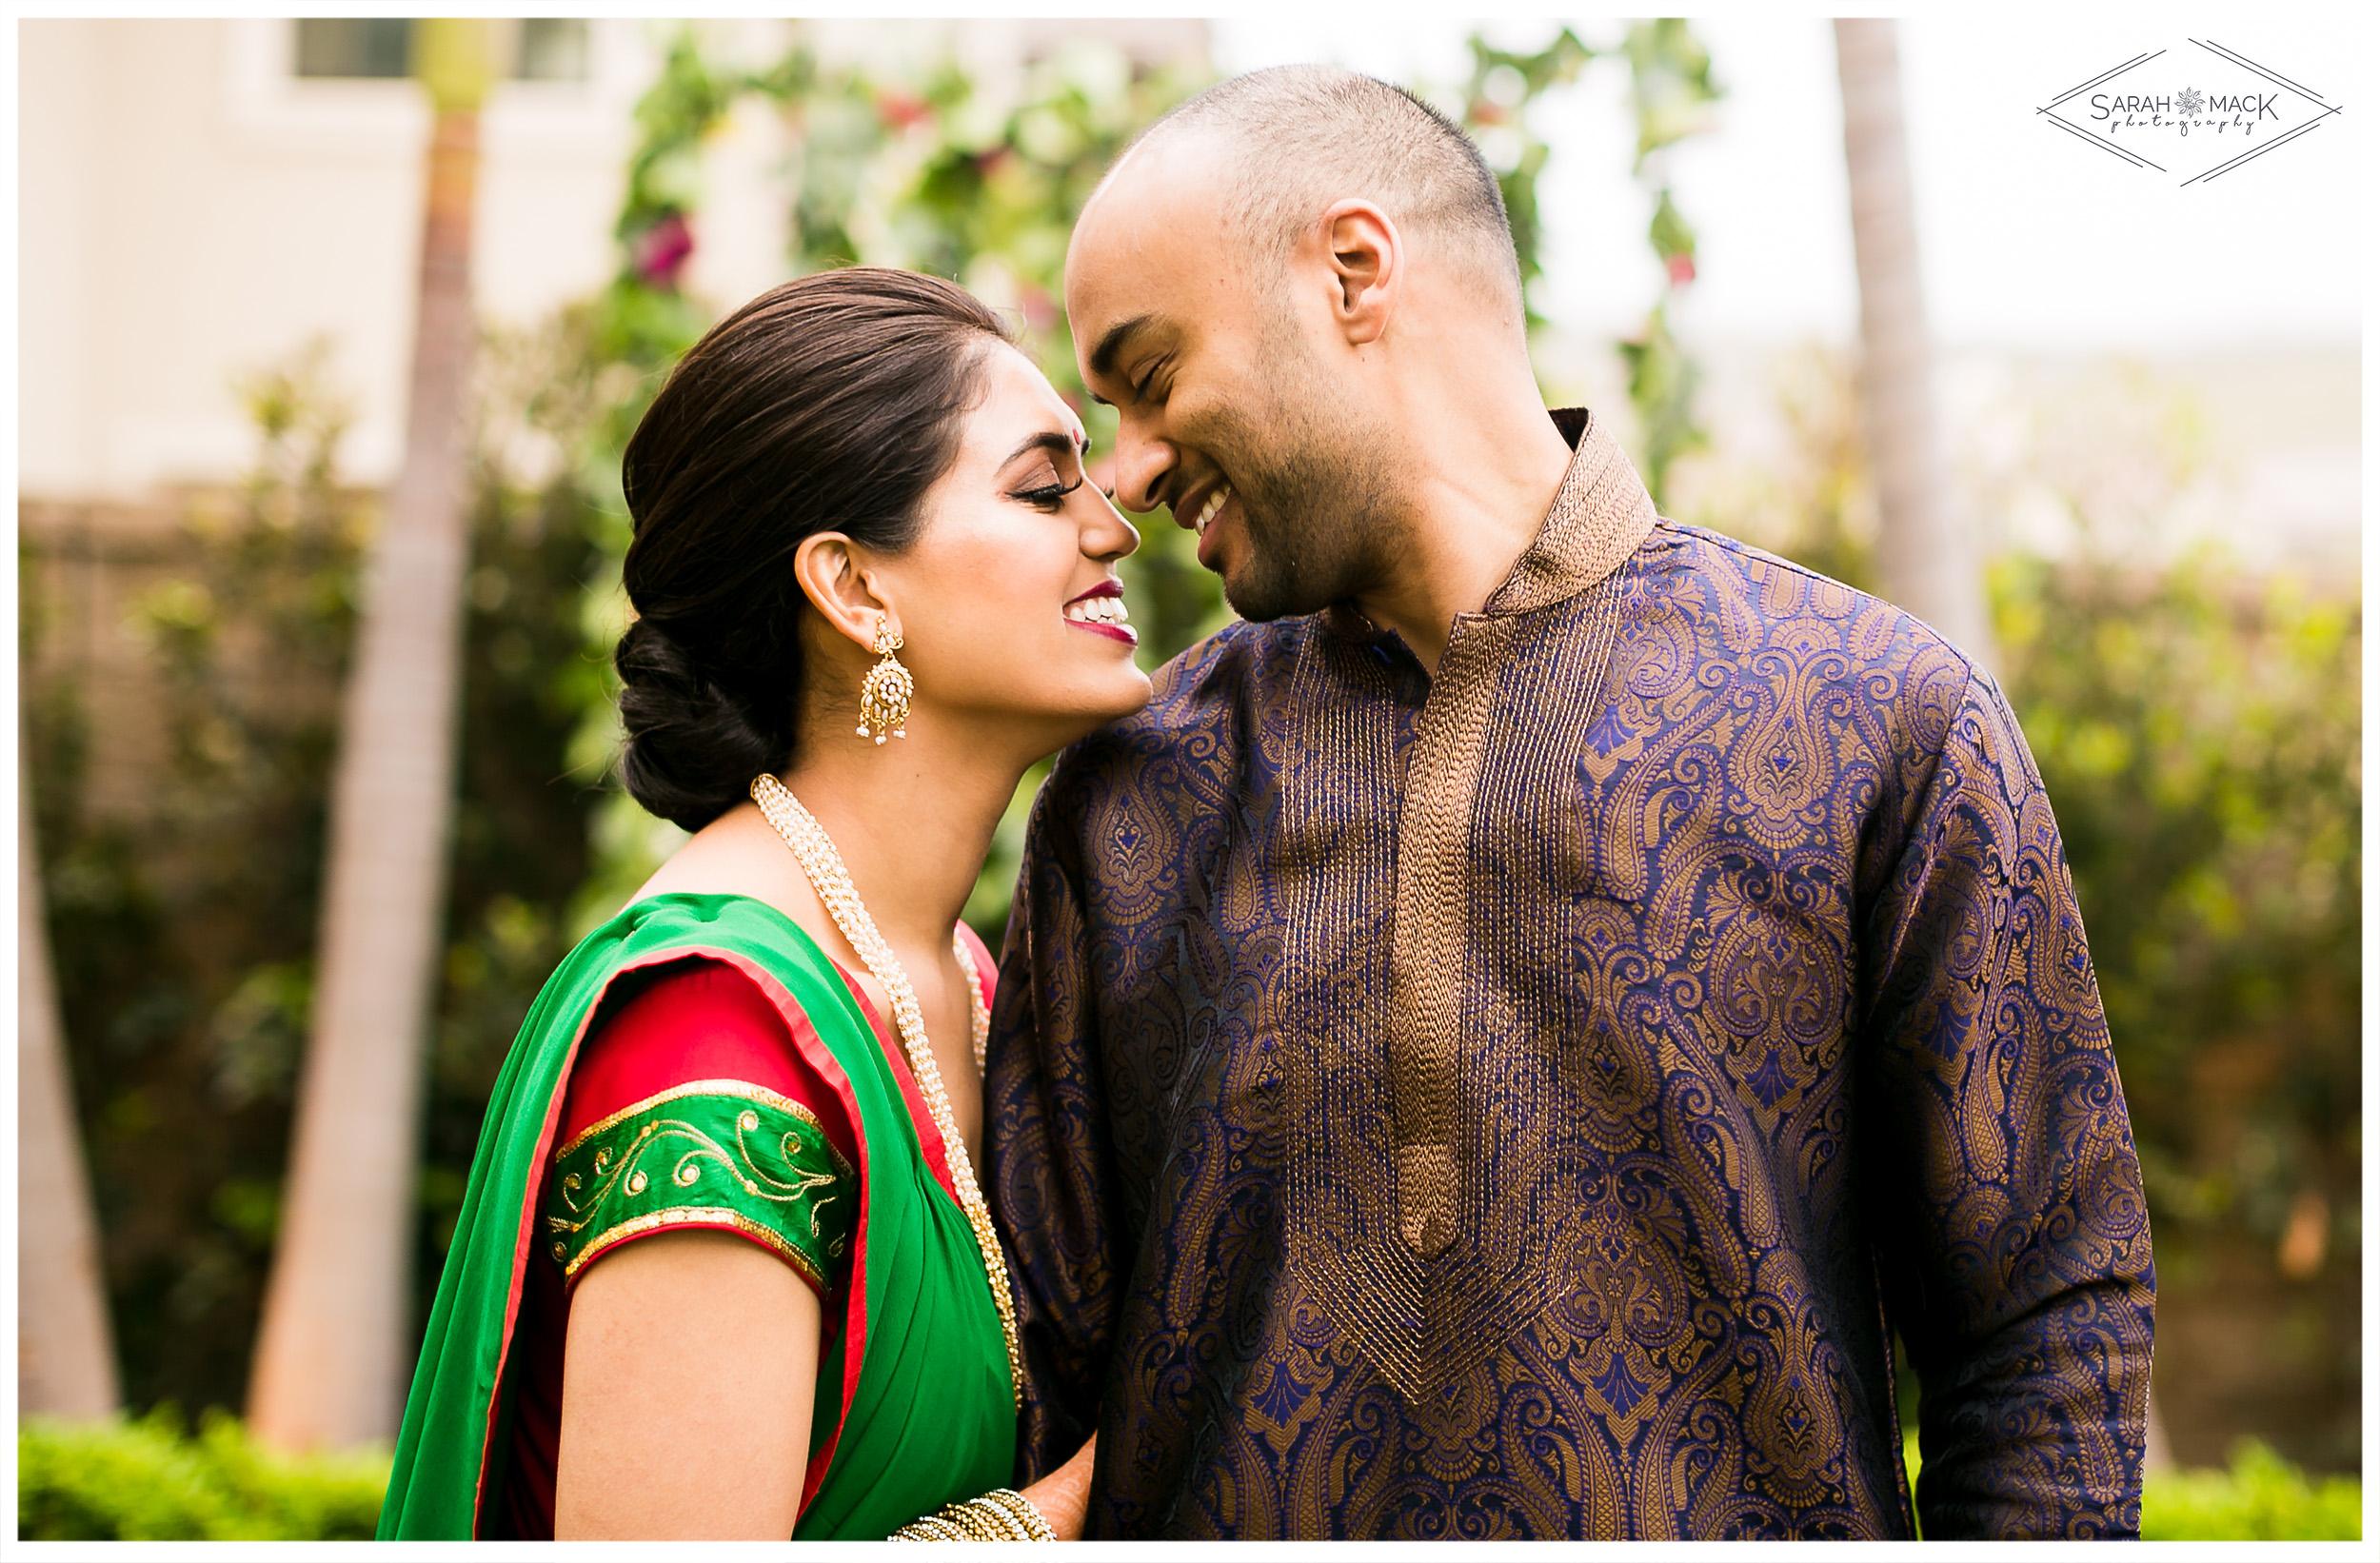 PR-Irvine-Ganesh-Pooja-Indian-Wedding-Photography-3.jpg